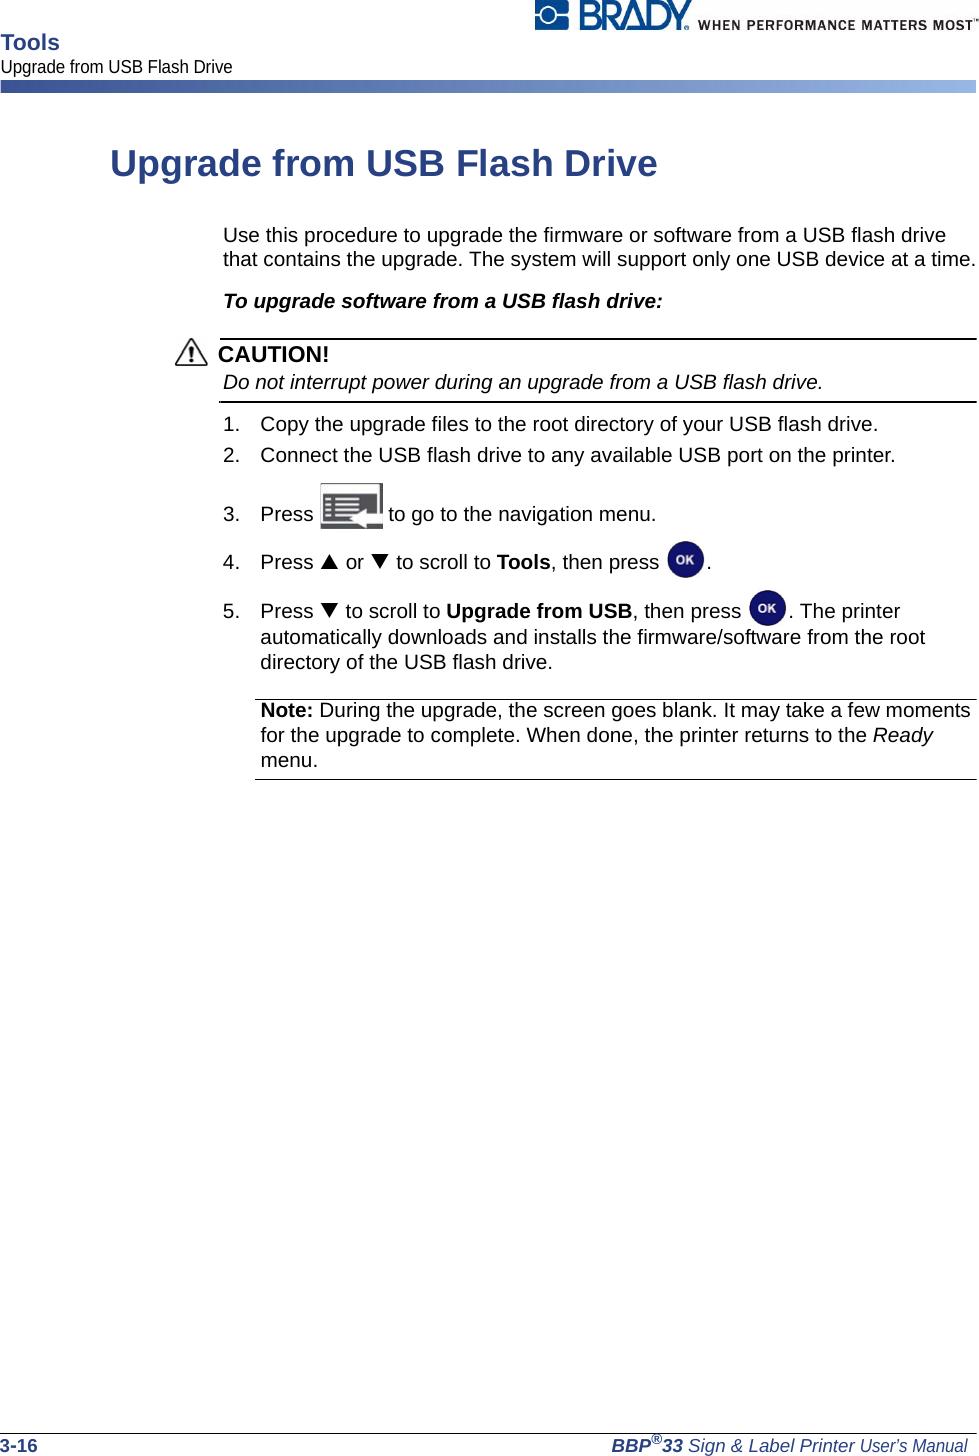 LabelZone Bbp33 Printer User Manual Us _SIMBA [BBP33] UG_EN